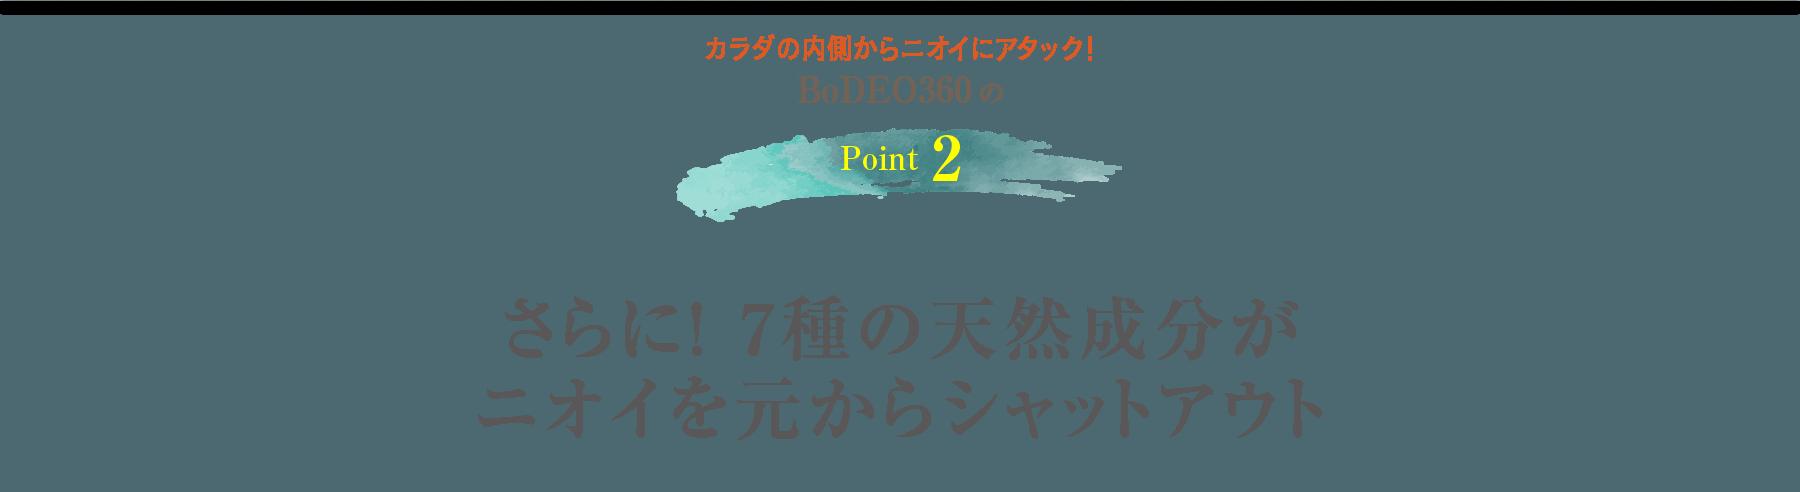 BoDEOのPOINT2 さらに! 7種の天然成分がニオイを元からシャットアウト